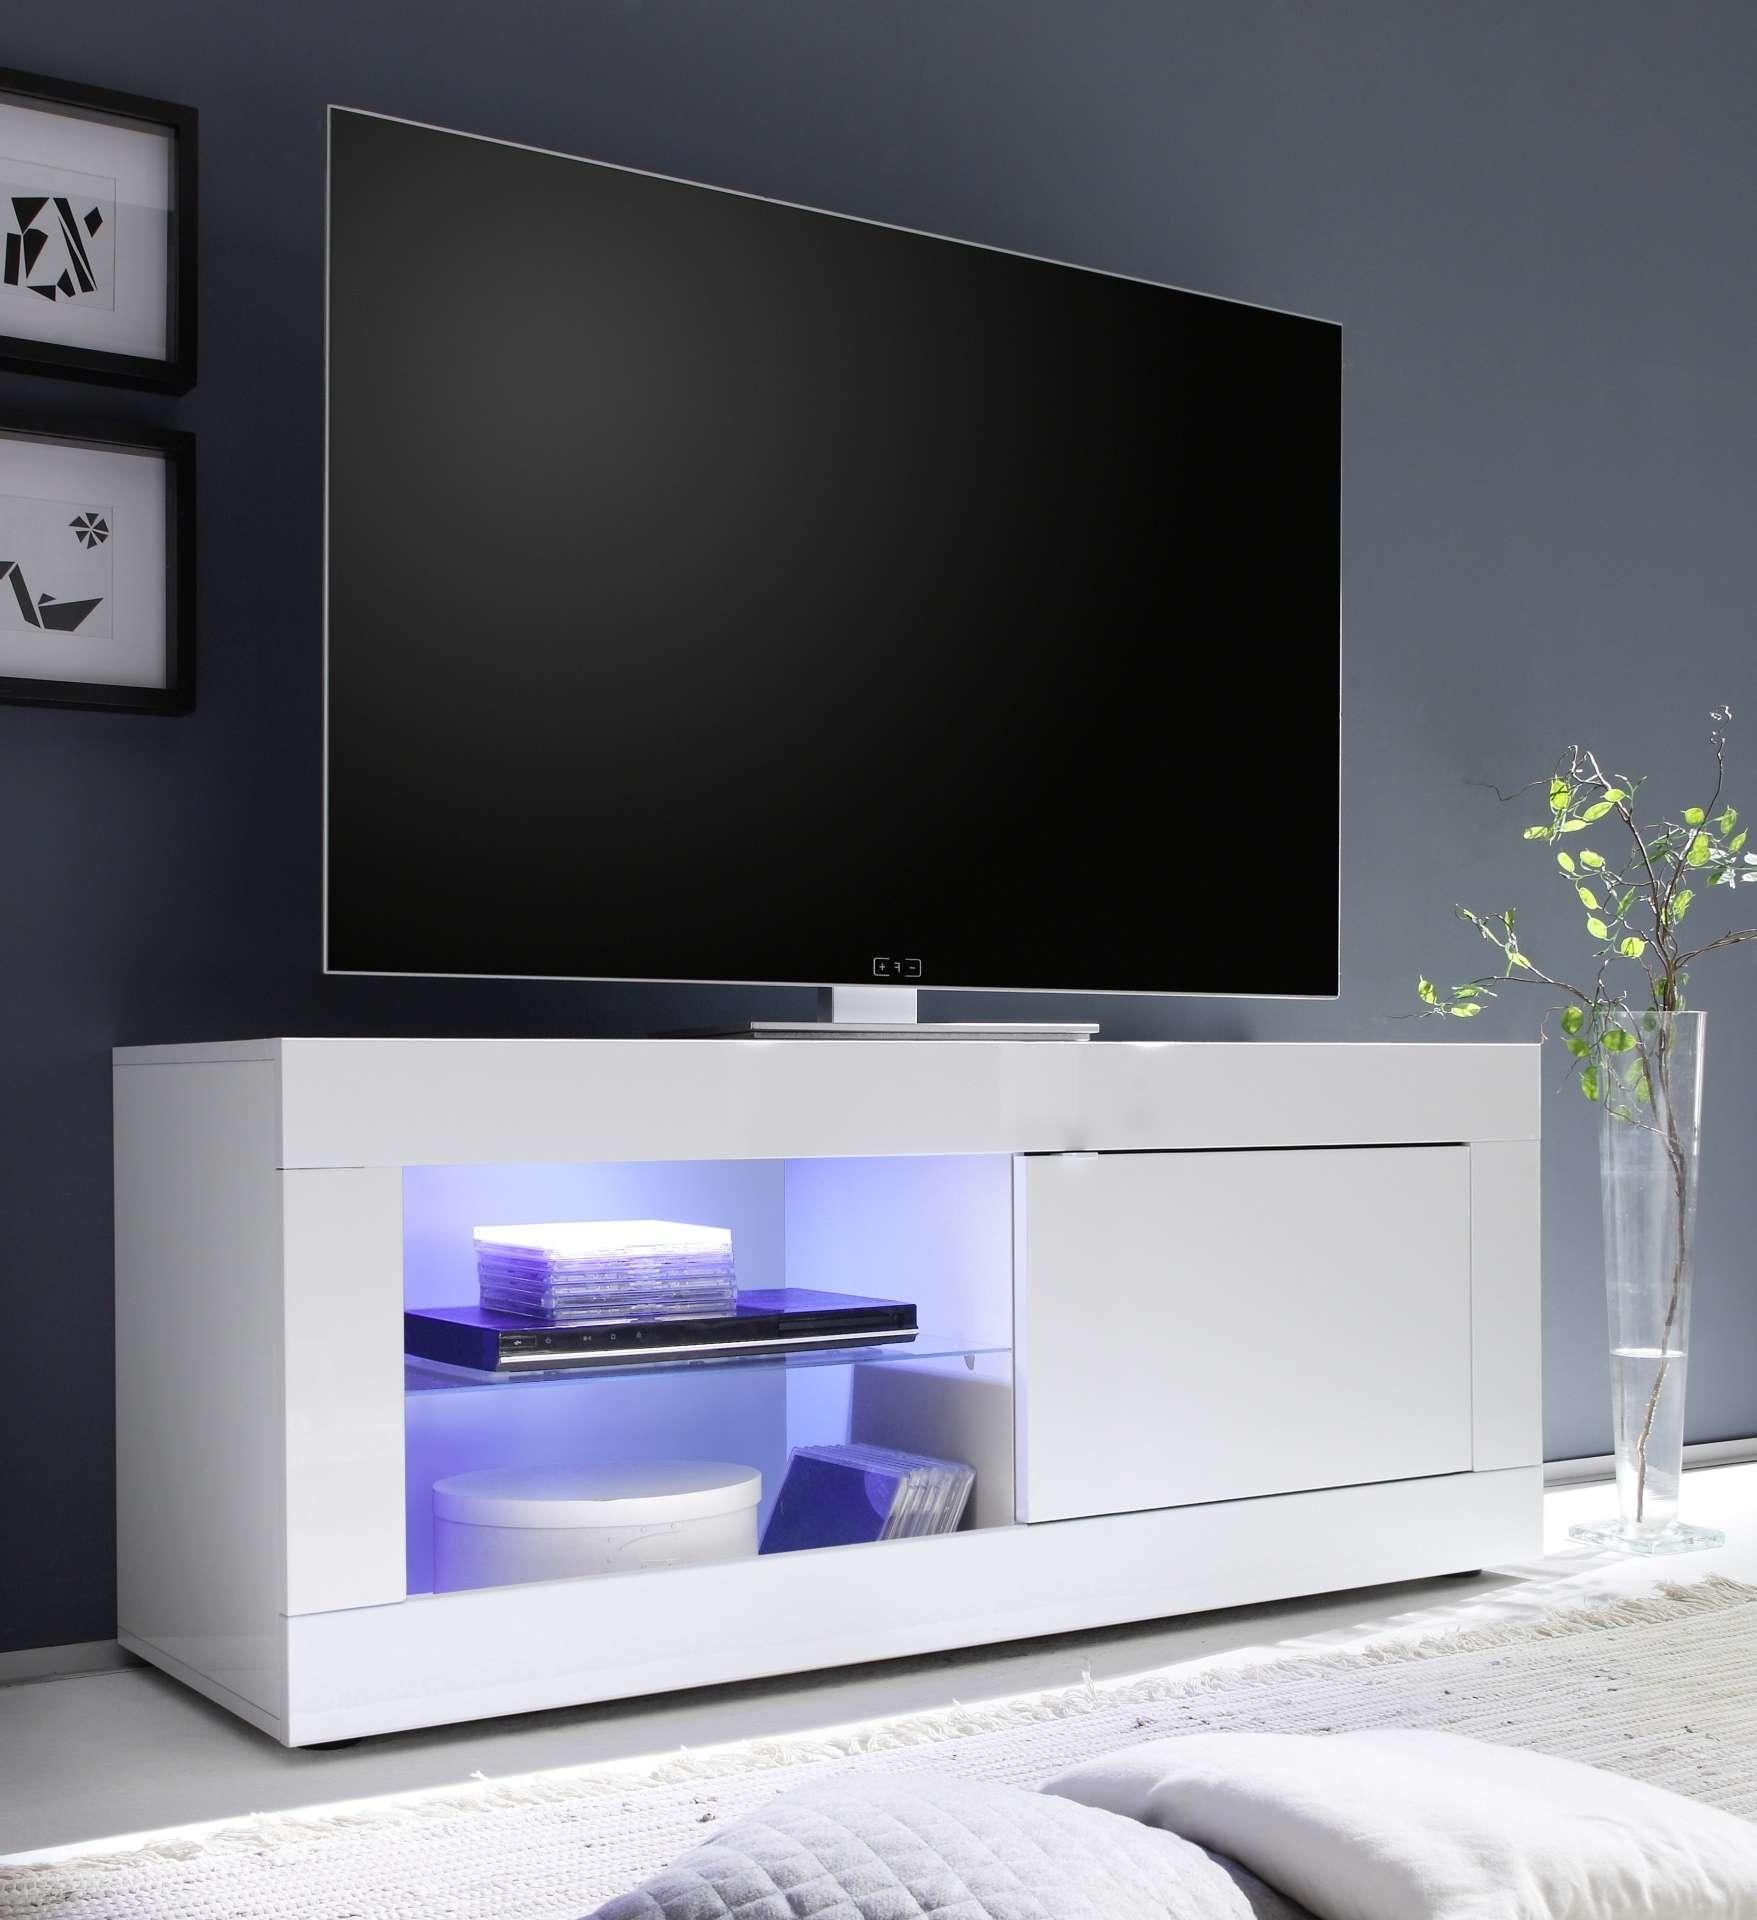 Tall Corner Tv Stand White (View 7 of 20)